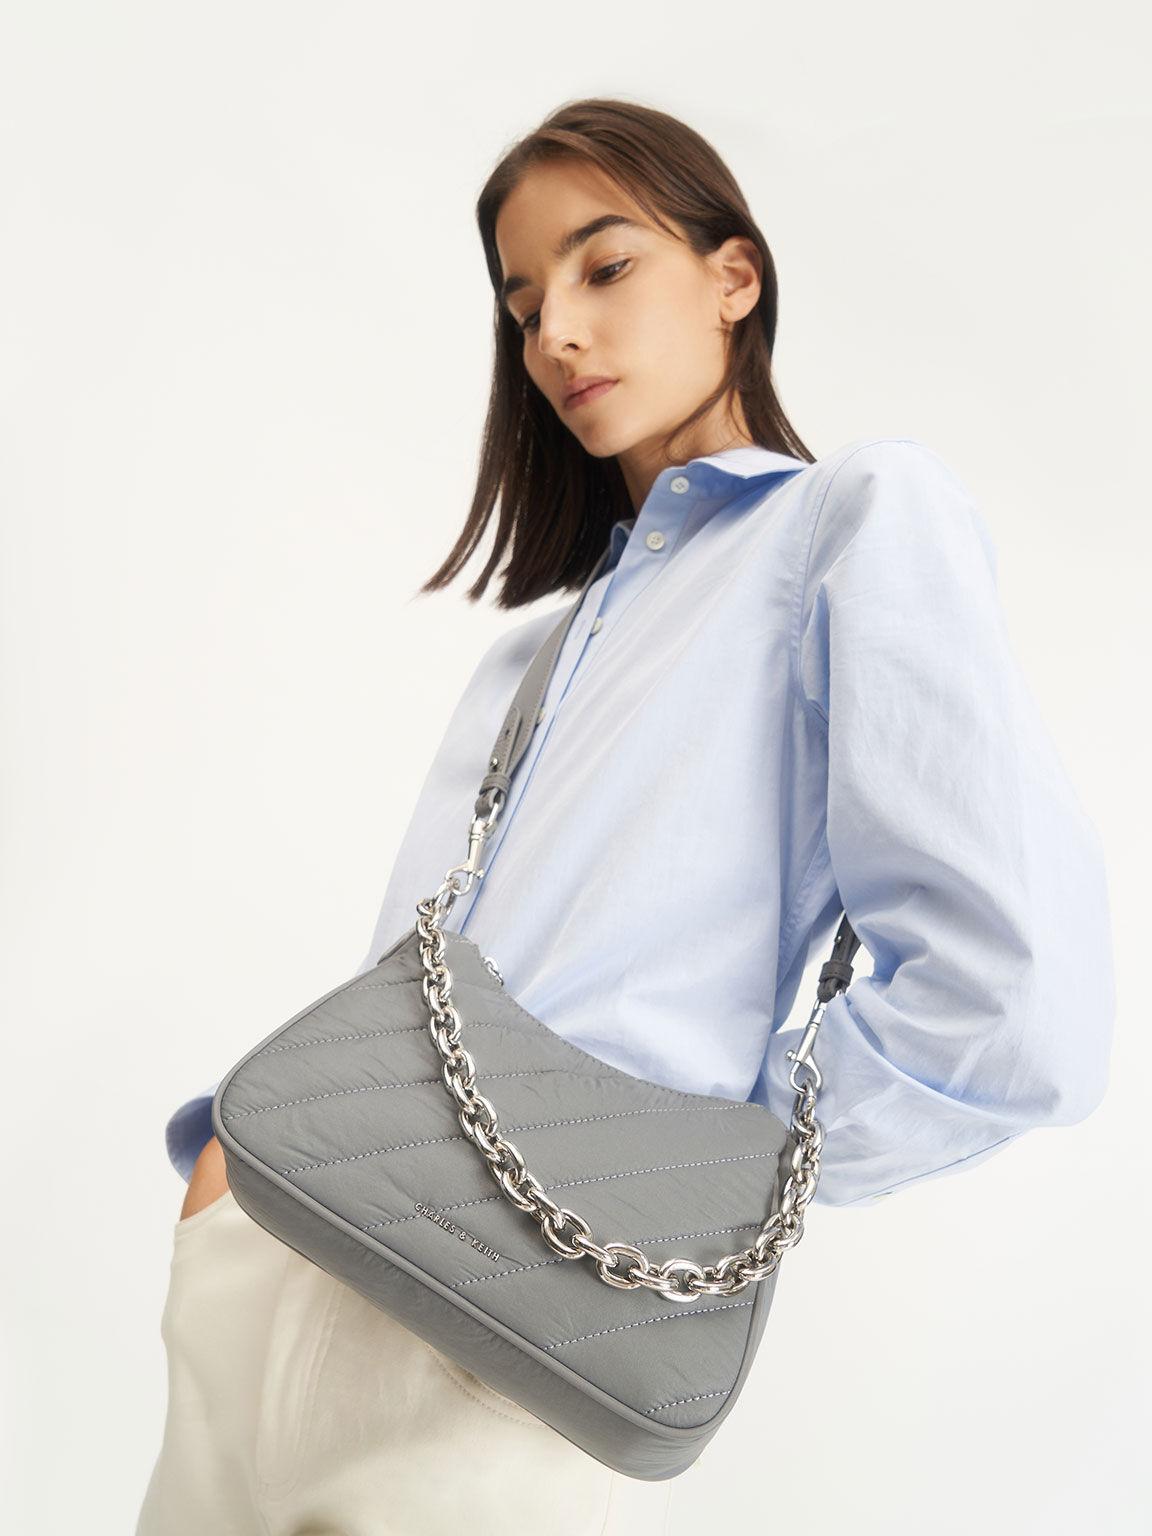 Panelled Chain Handle Crossbody Bag, Grey, hi-res